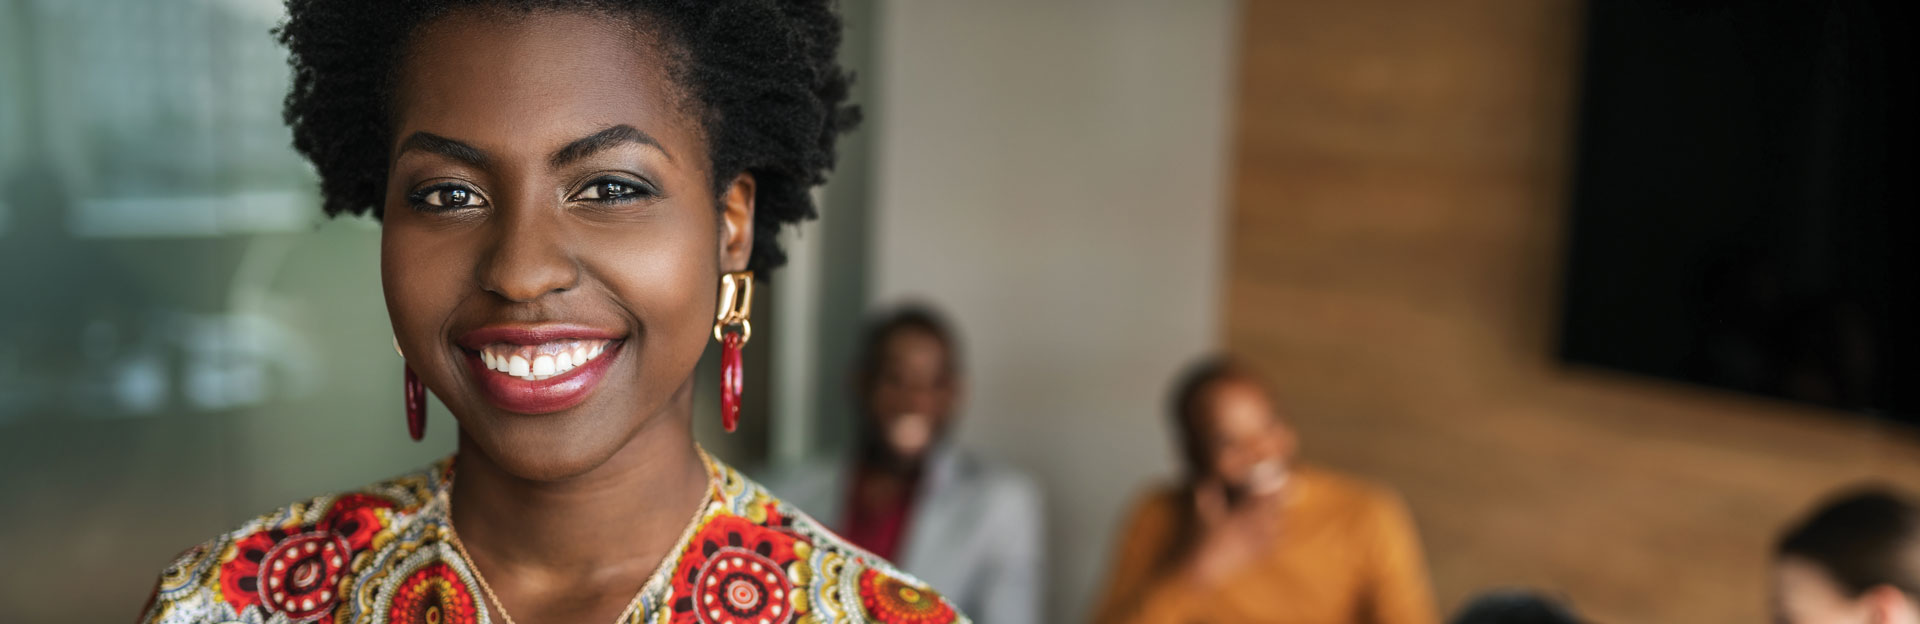 Promoting Gender-Balanced Leadership: Empowering Women to Climb the Career Ladder